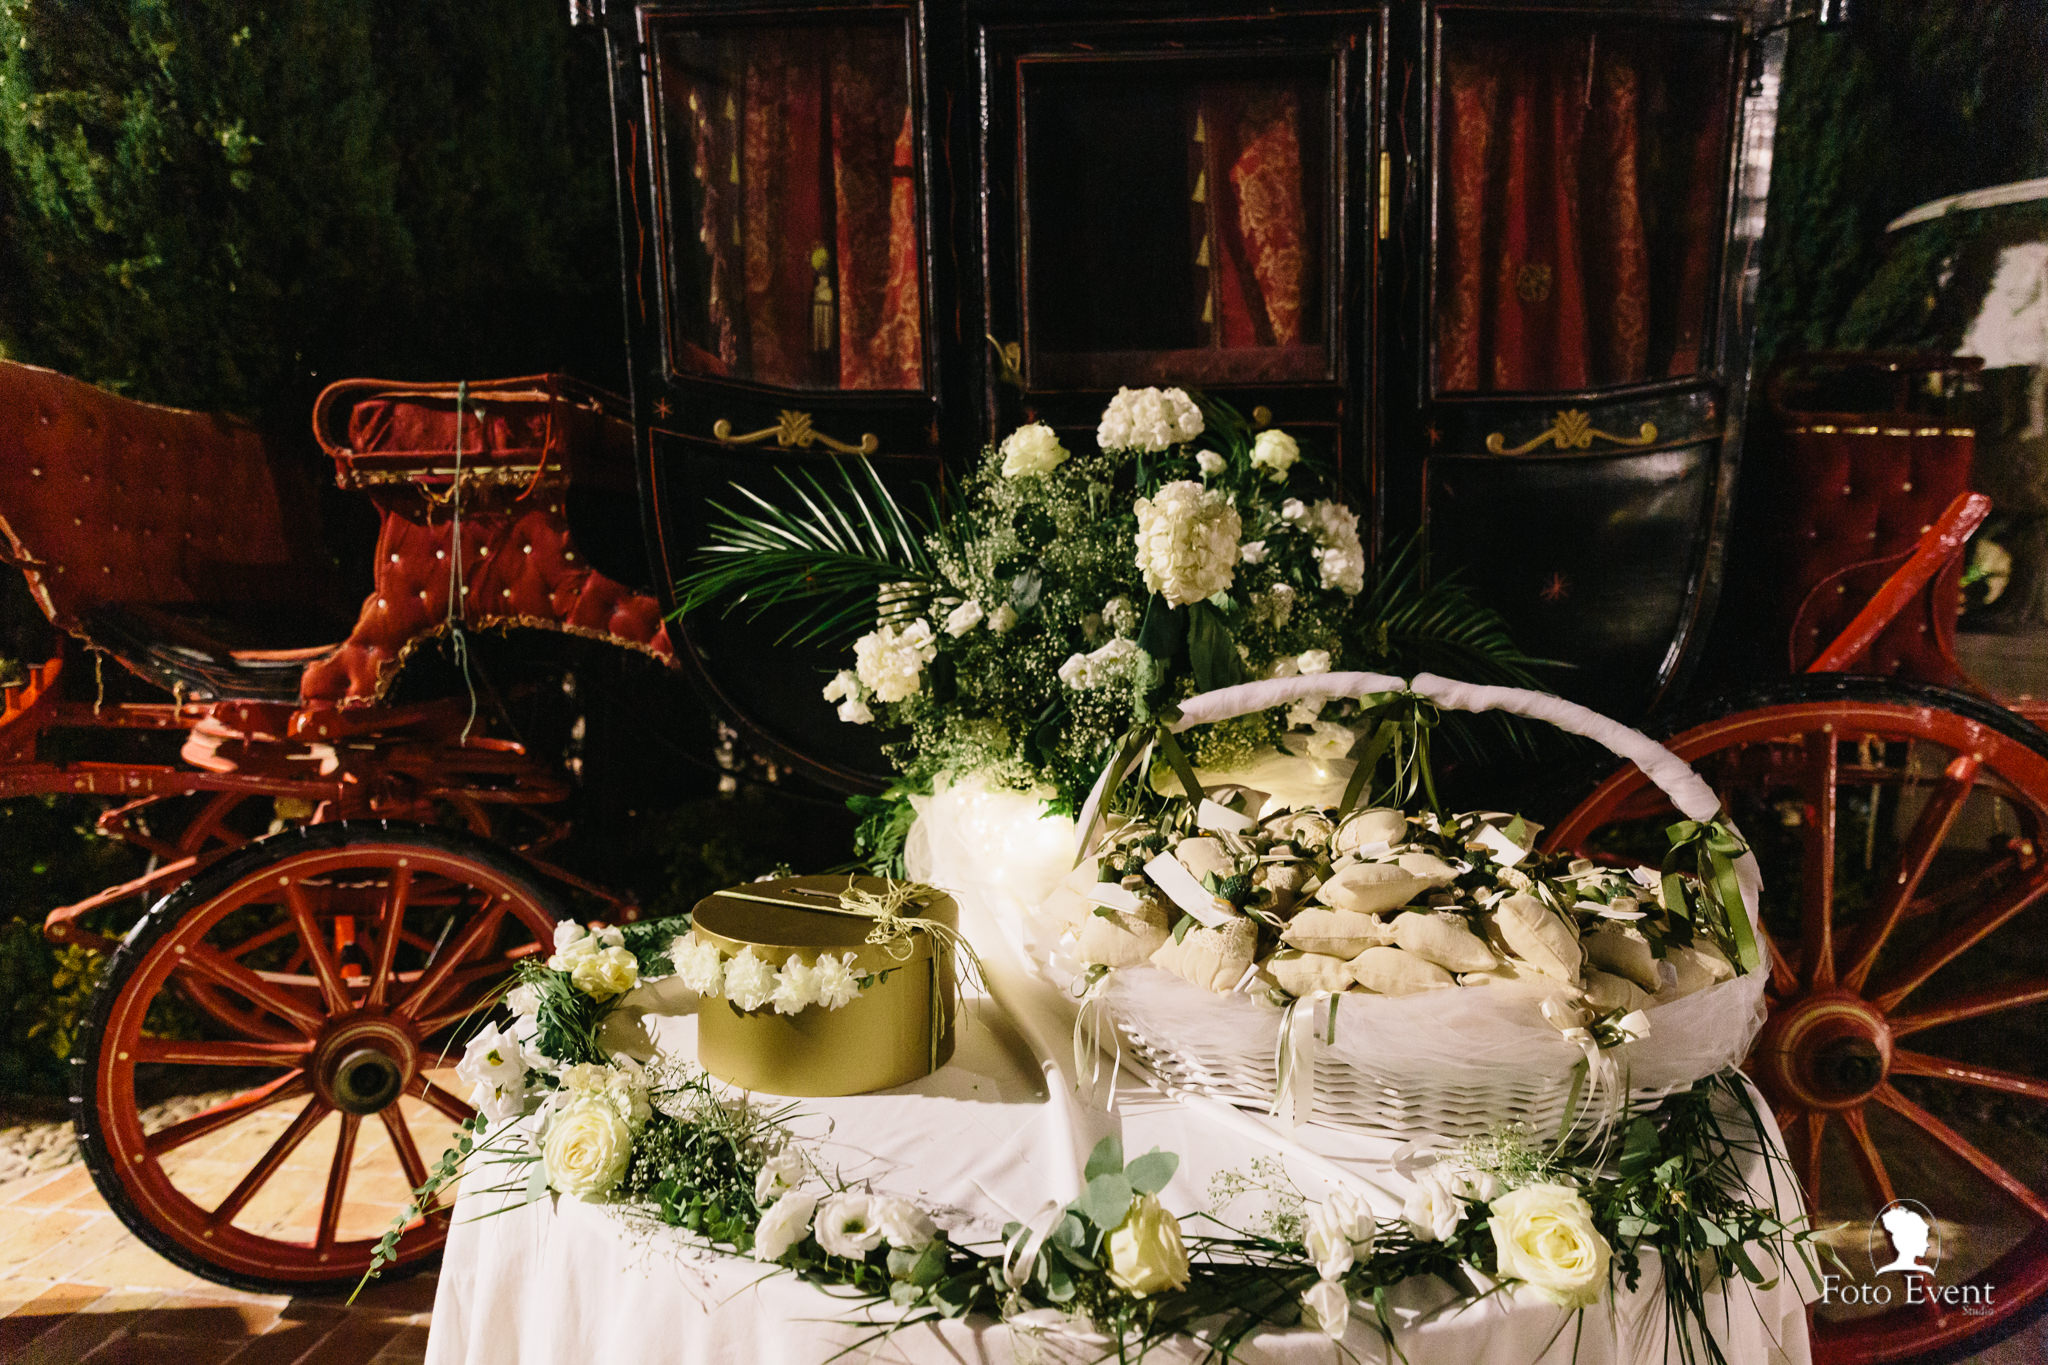 051-2019-08-23-Matrimonio-Lucia-e-Rosario-Scopelliti-5DE-2598